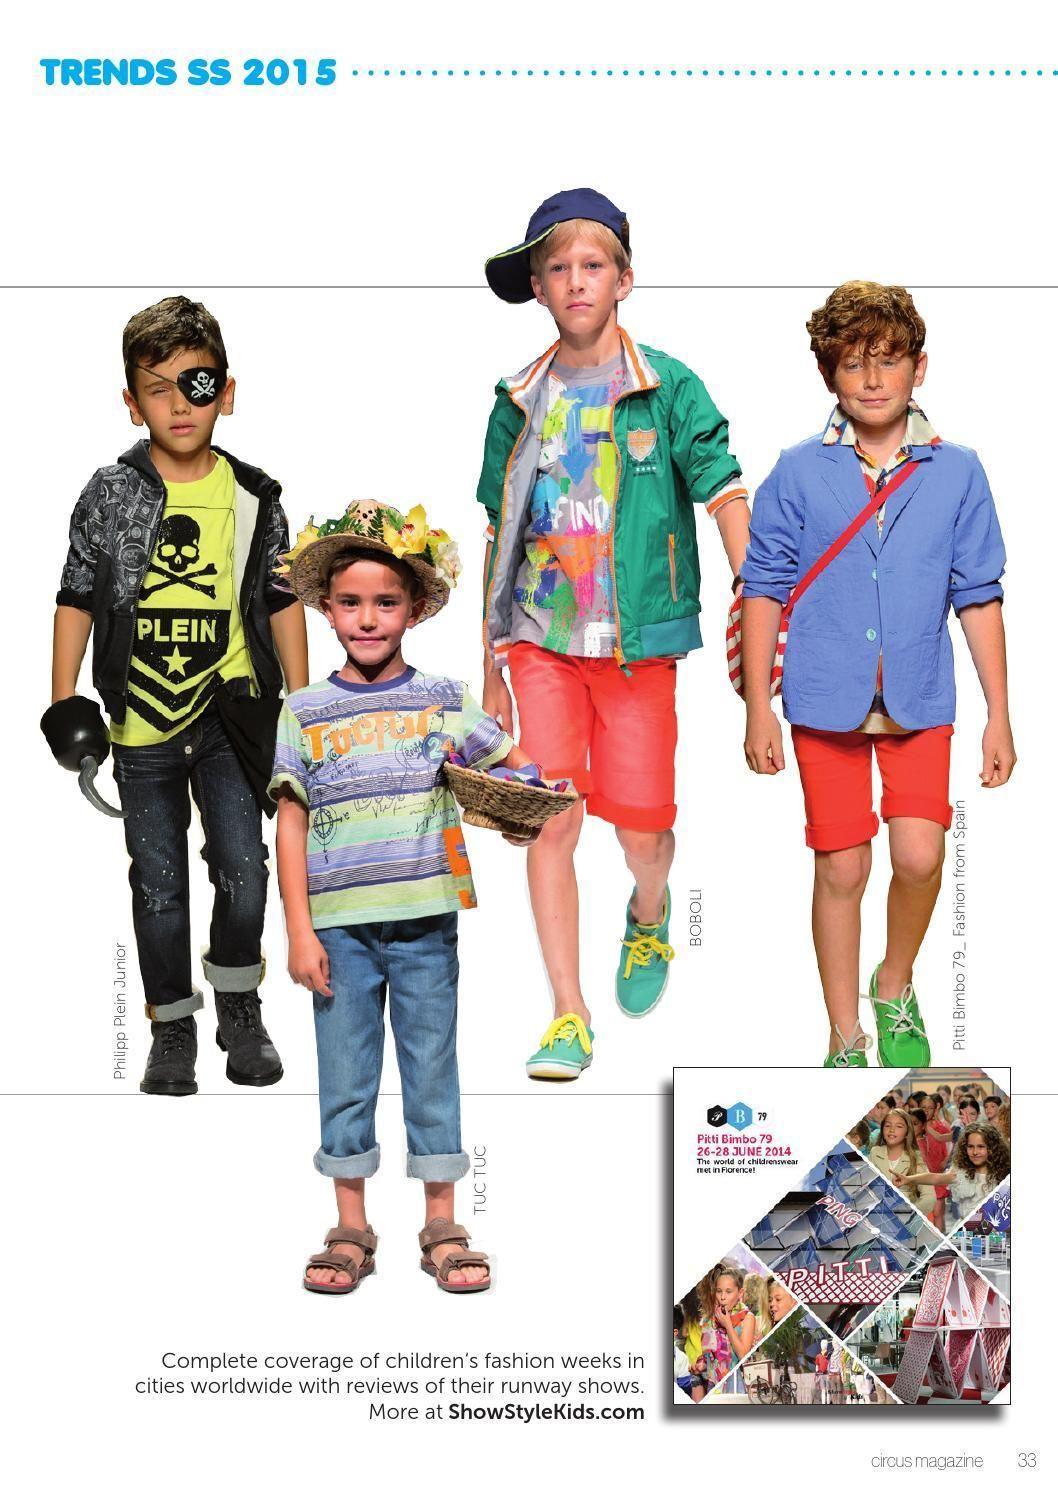 Circus Magazine 4*2014 | 2016 forecast | Kids fashion